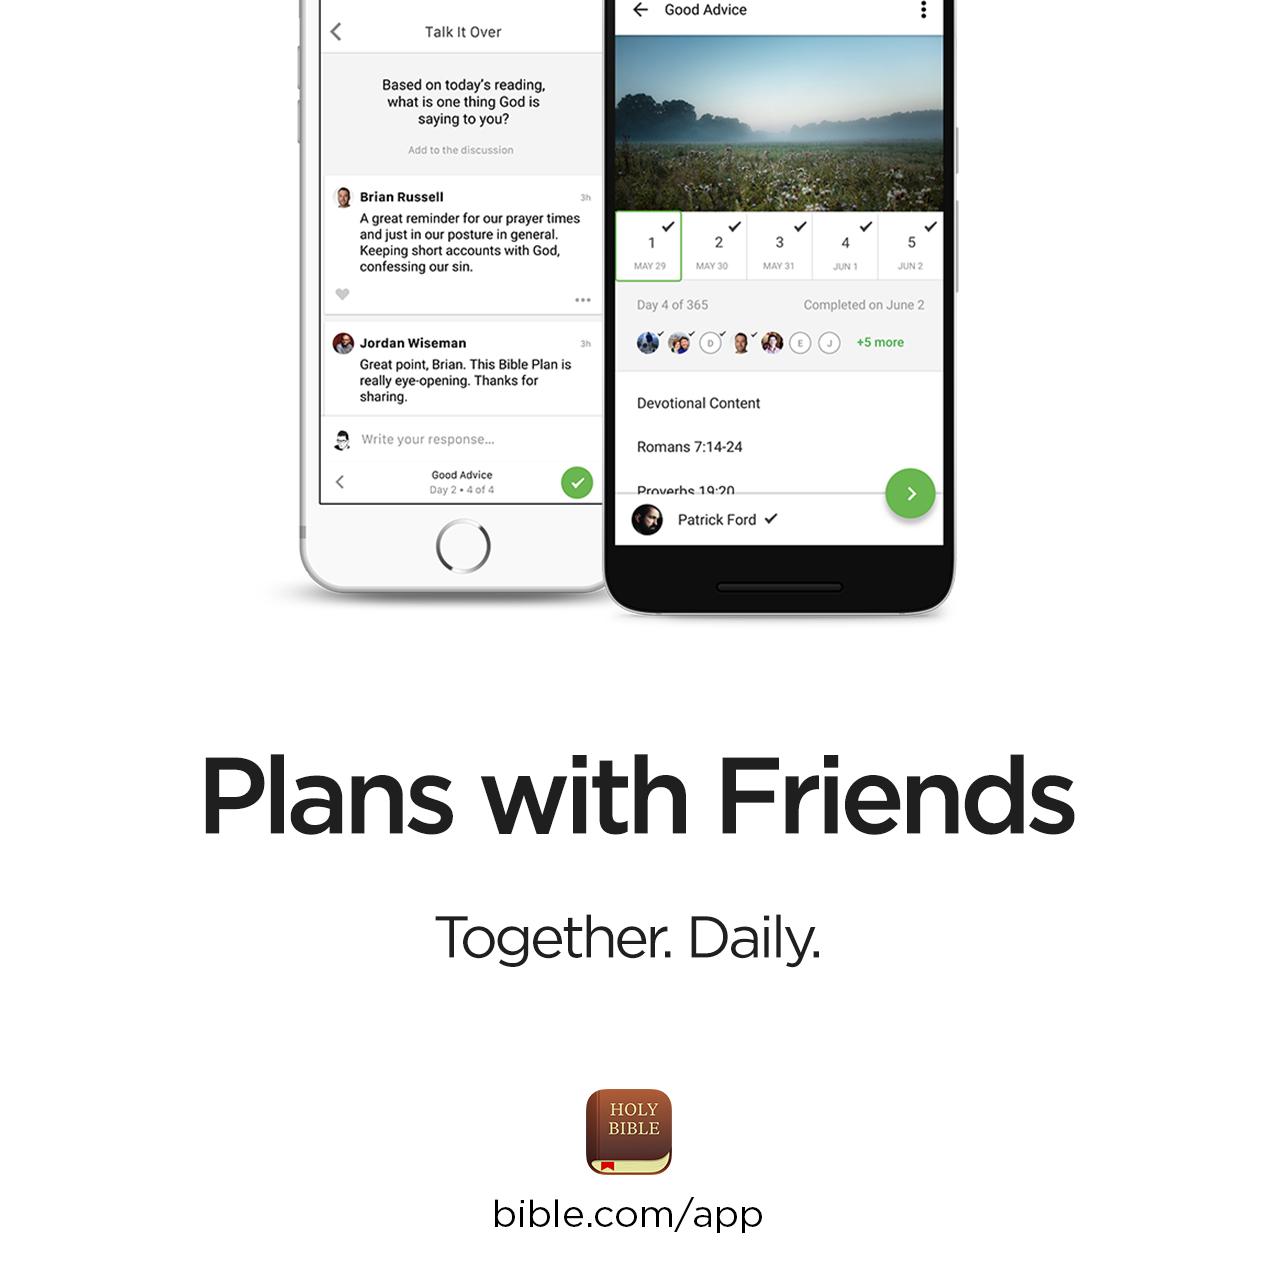 YV_PlanswithFriends_SocialSquare.jpg